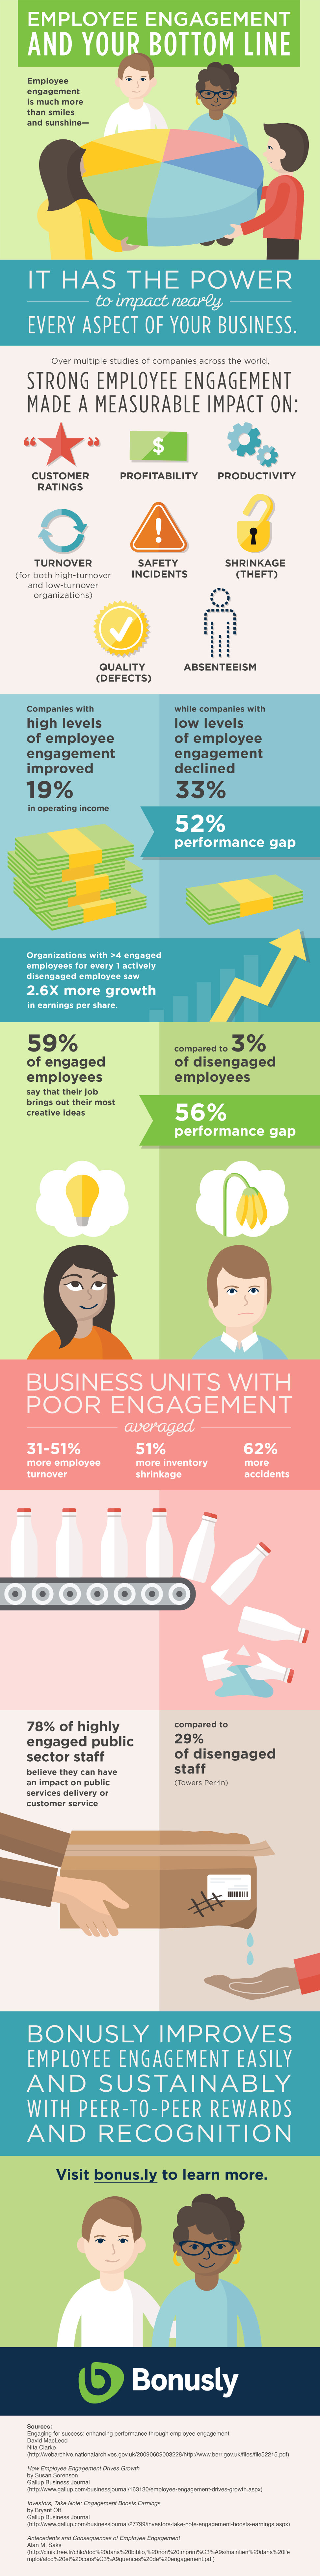 The Economy of Employee Engagement